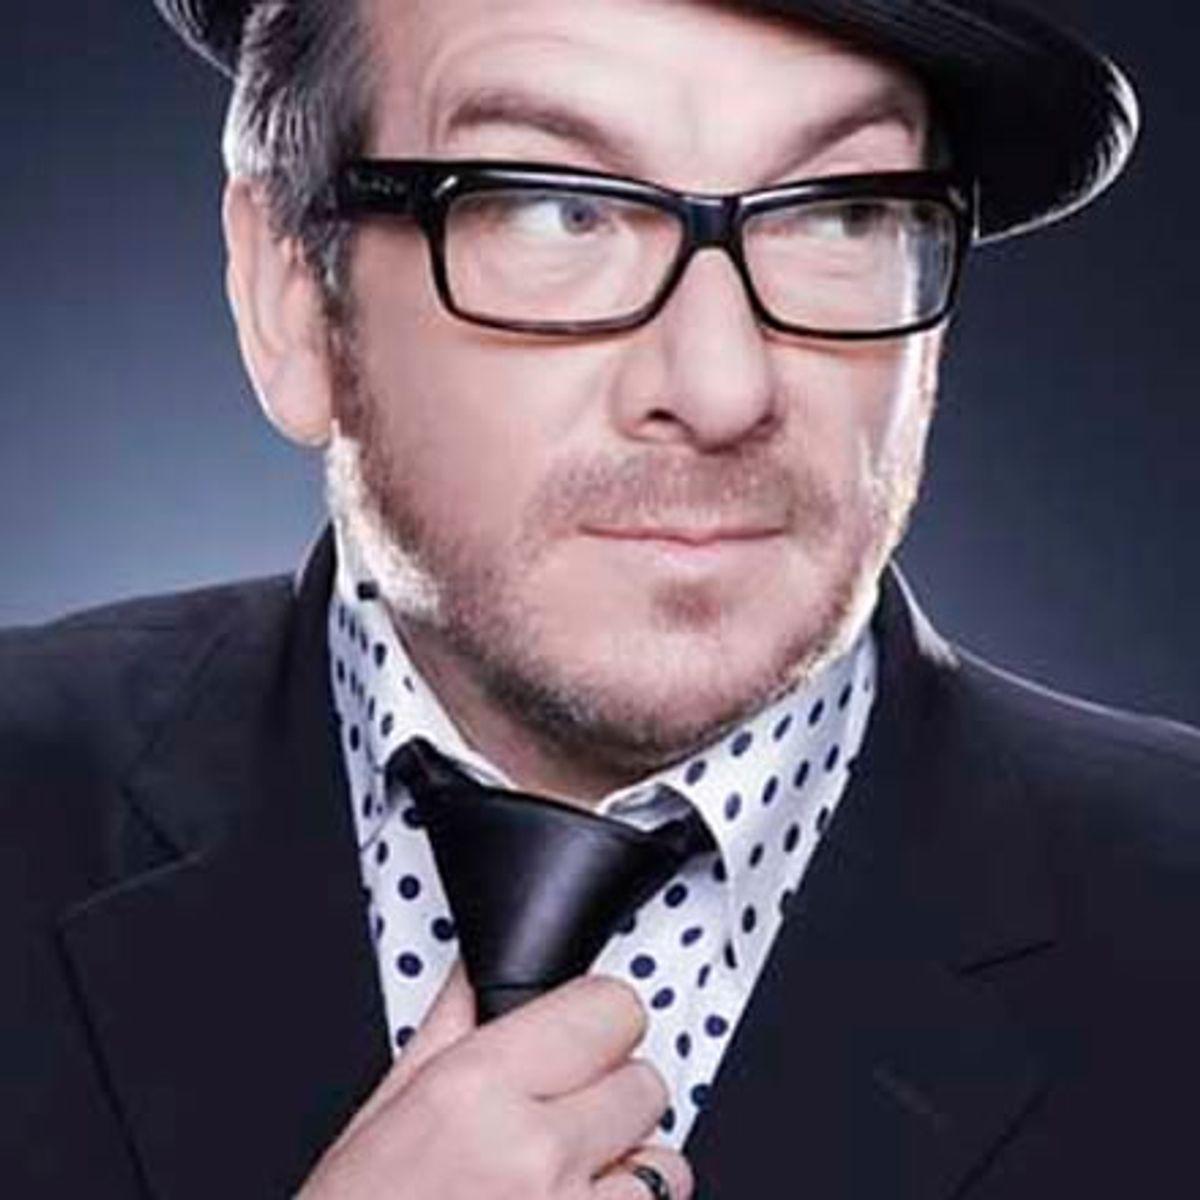 Elvis Costello's Spectacular Spinning Songbook</b> - Persoonlijke airconditioning